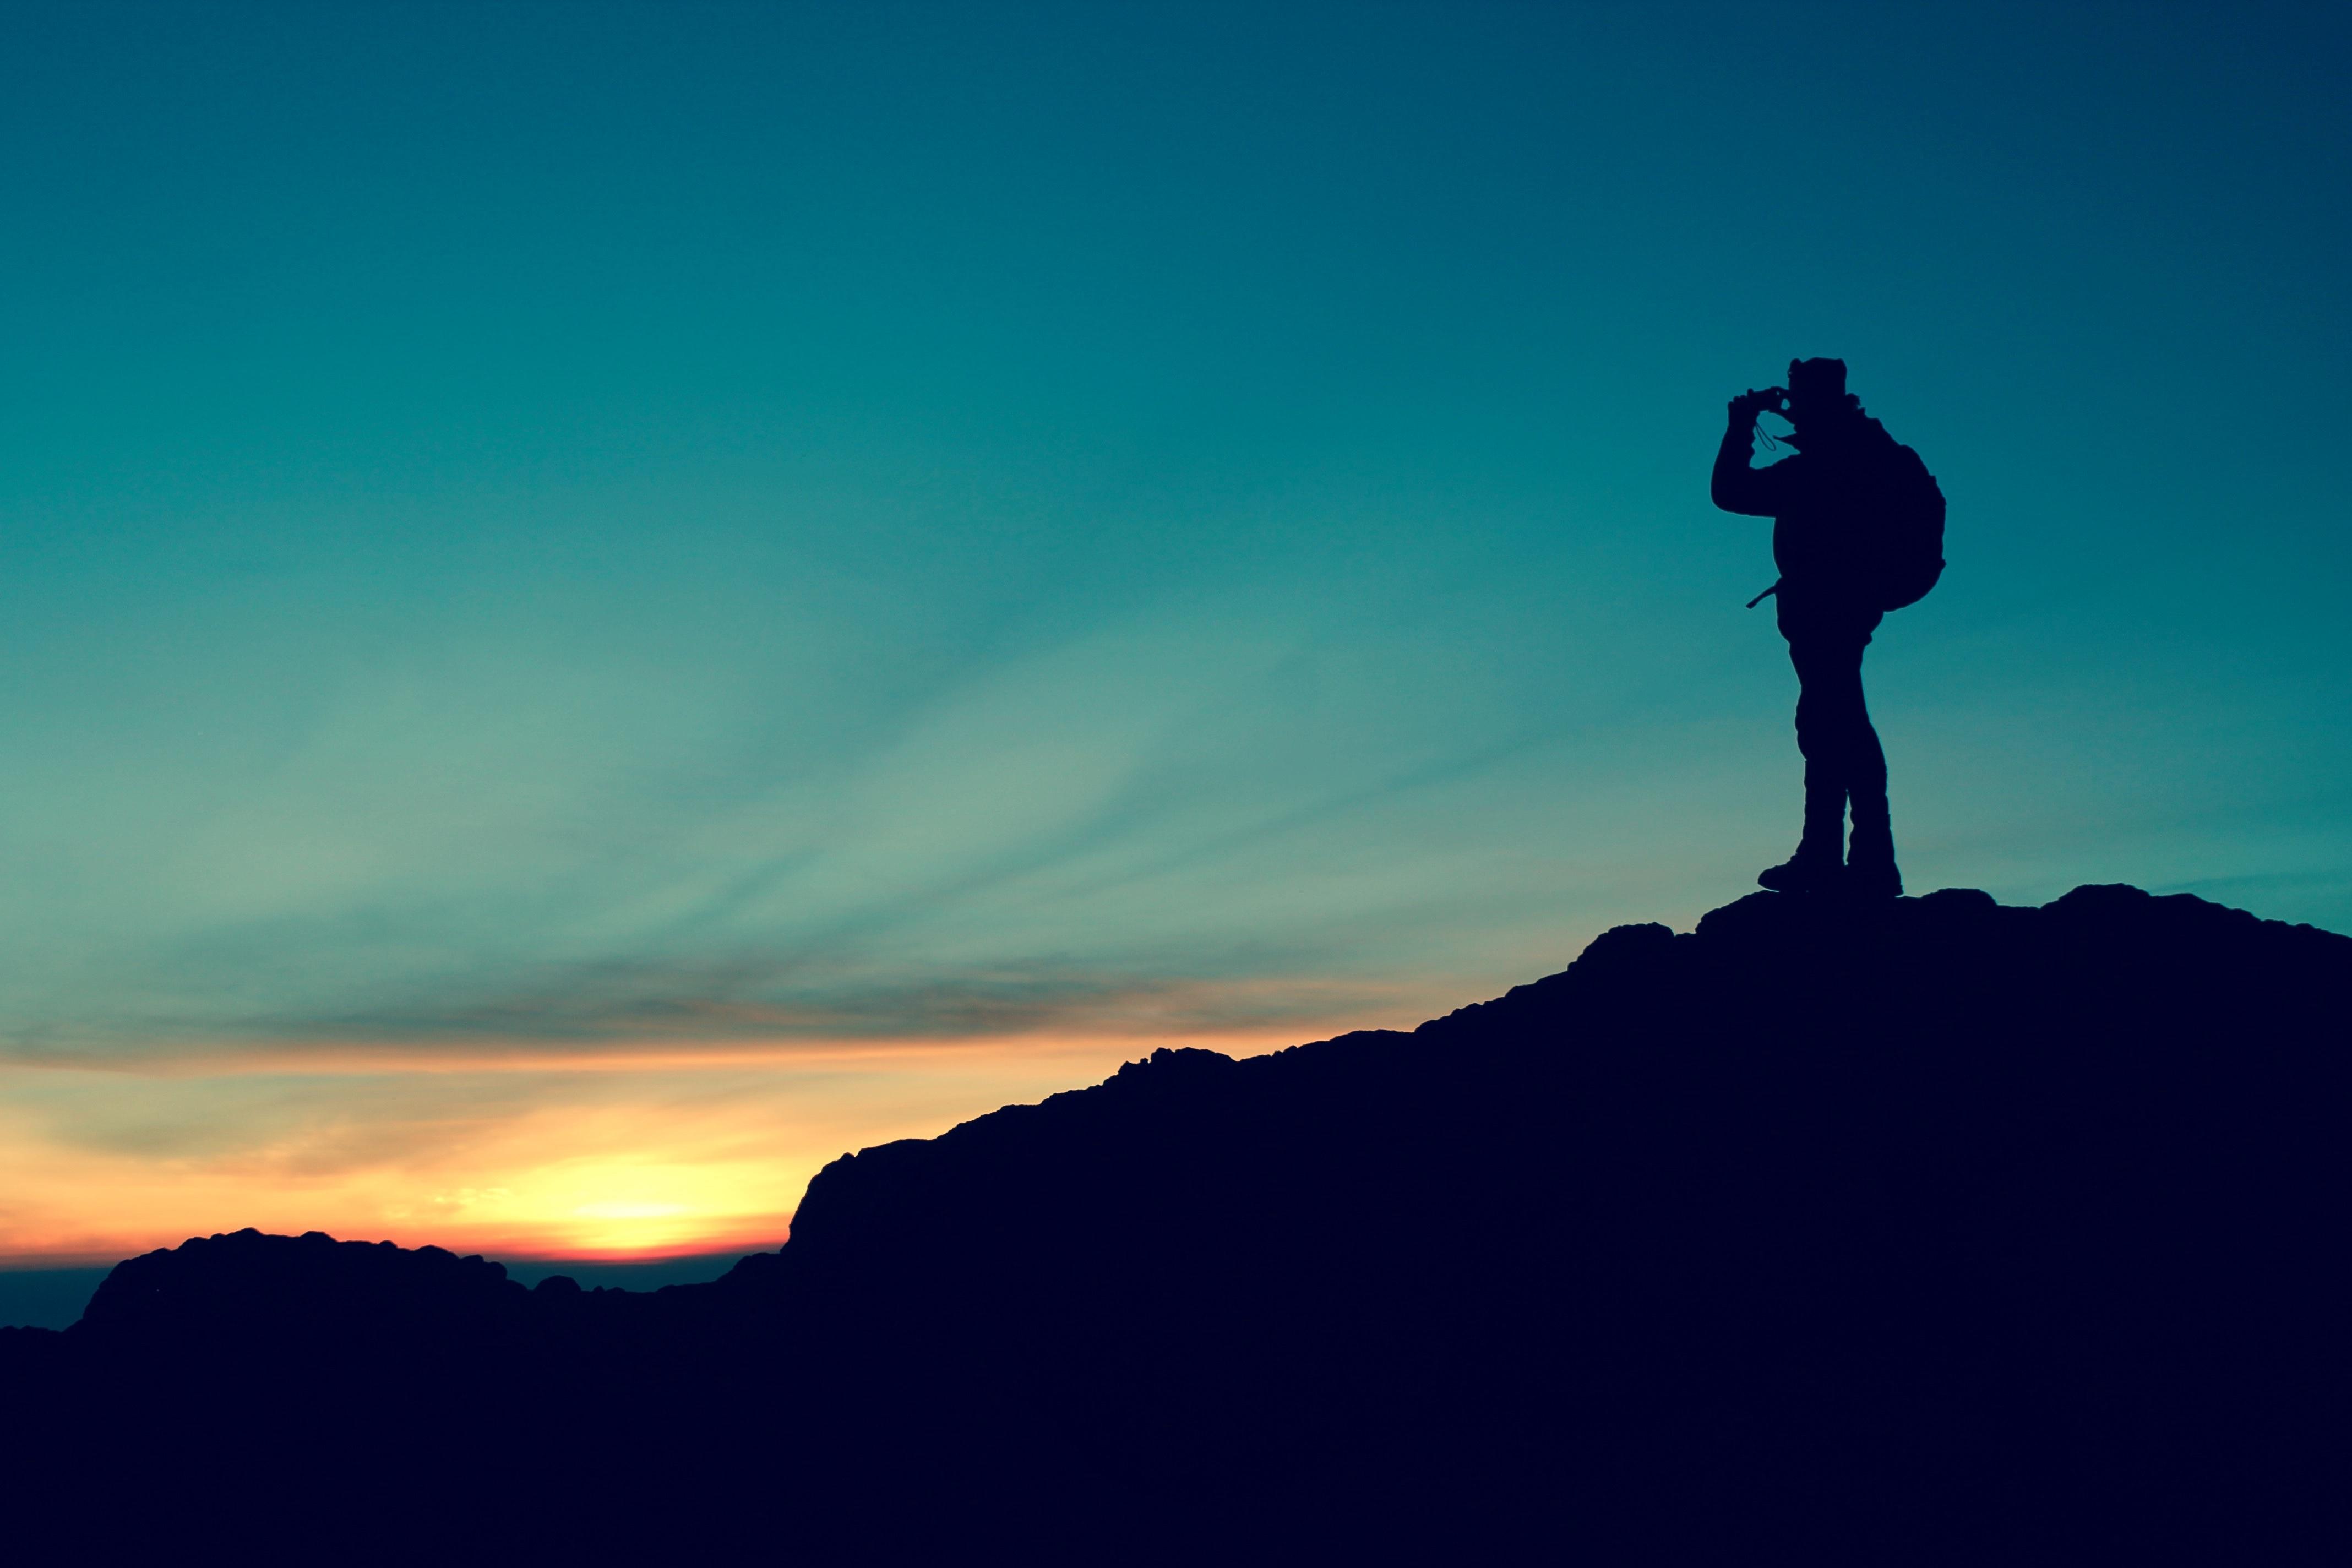 Gambar : manusia, pemandangan, laut, alam, batu, horison, bayangan